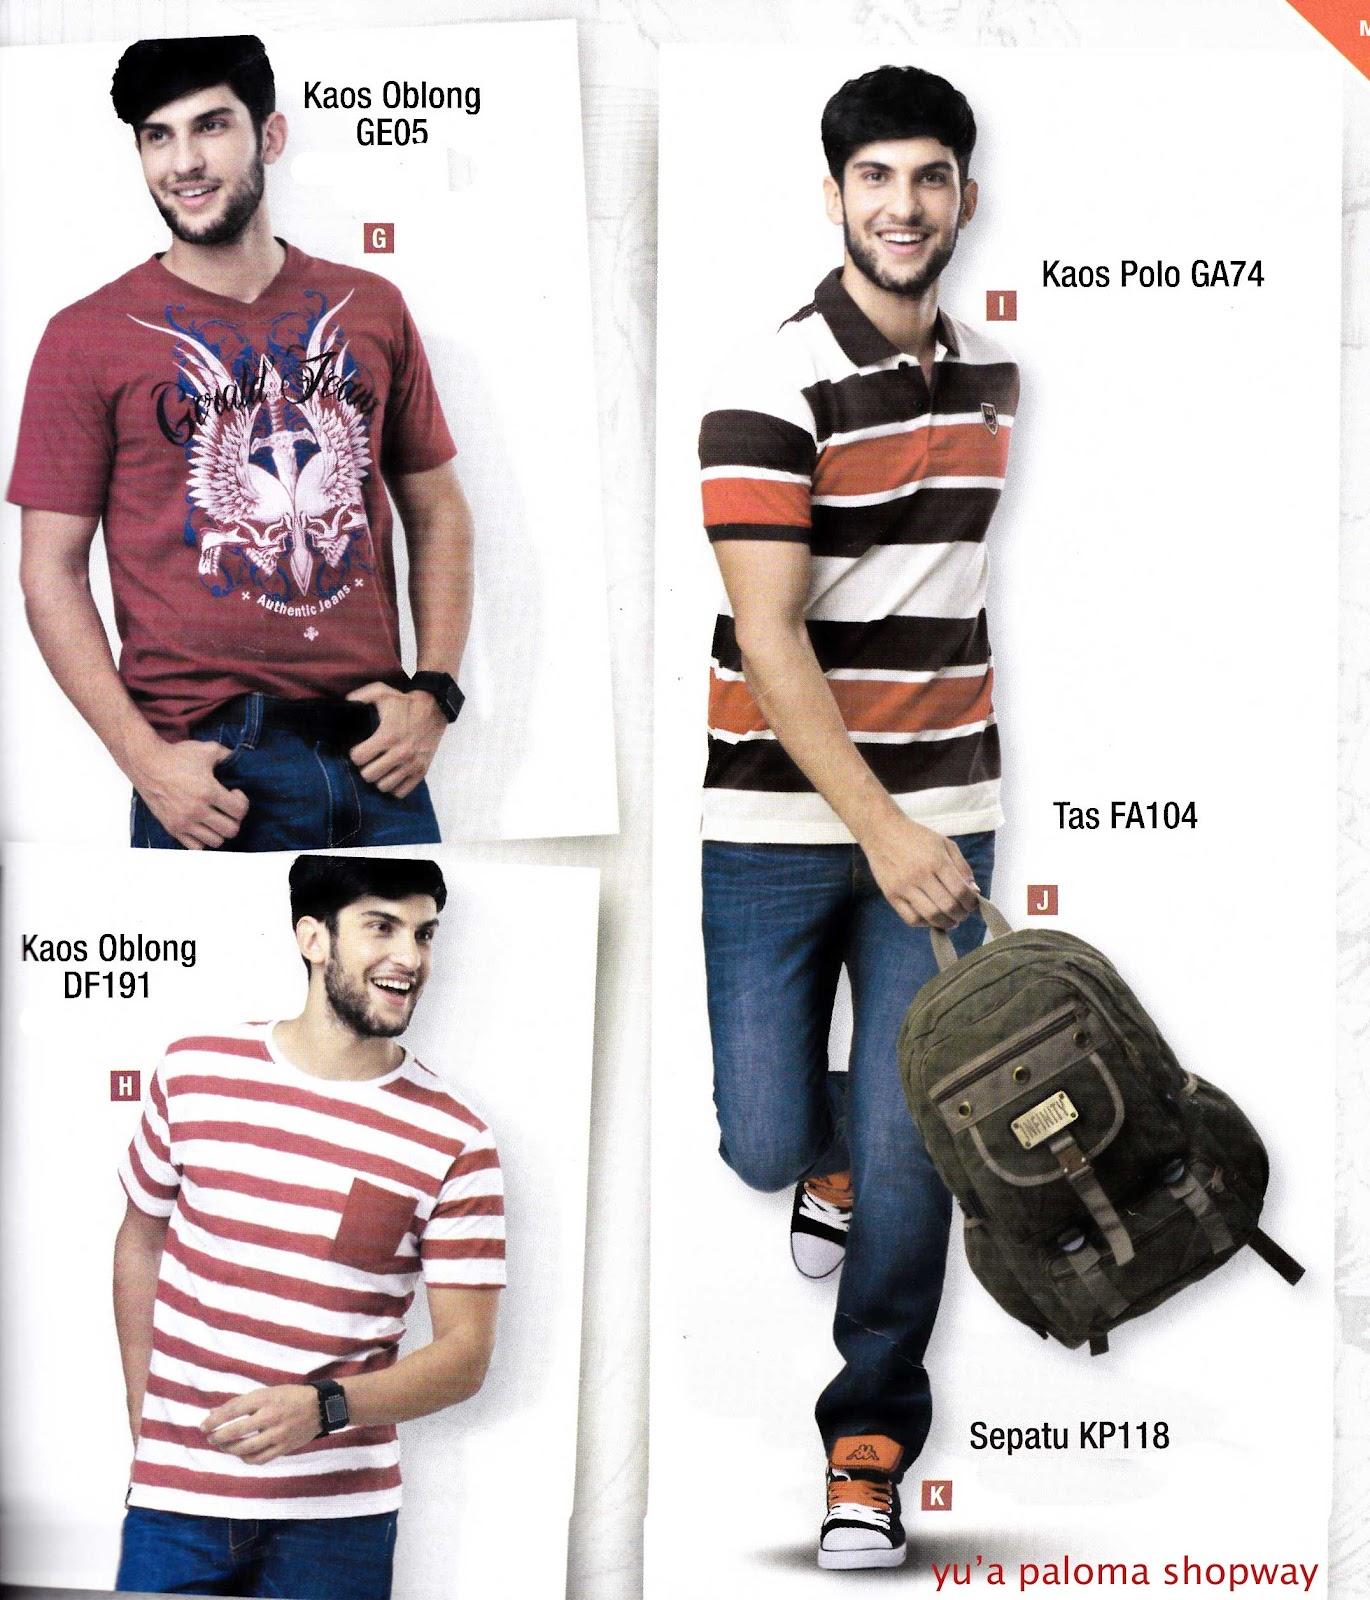 Yua Paloma Shopway Katalog 22 Pakaian Tas Pria Katalig Kaos Lelaki